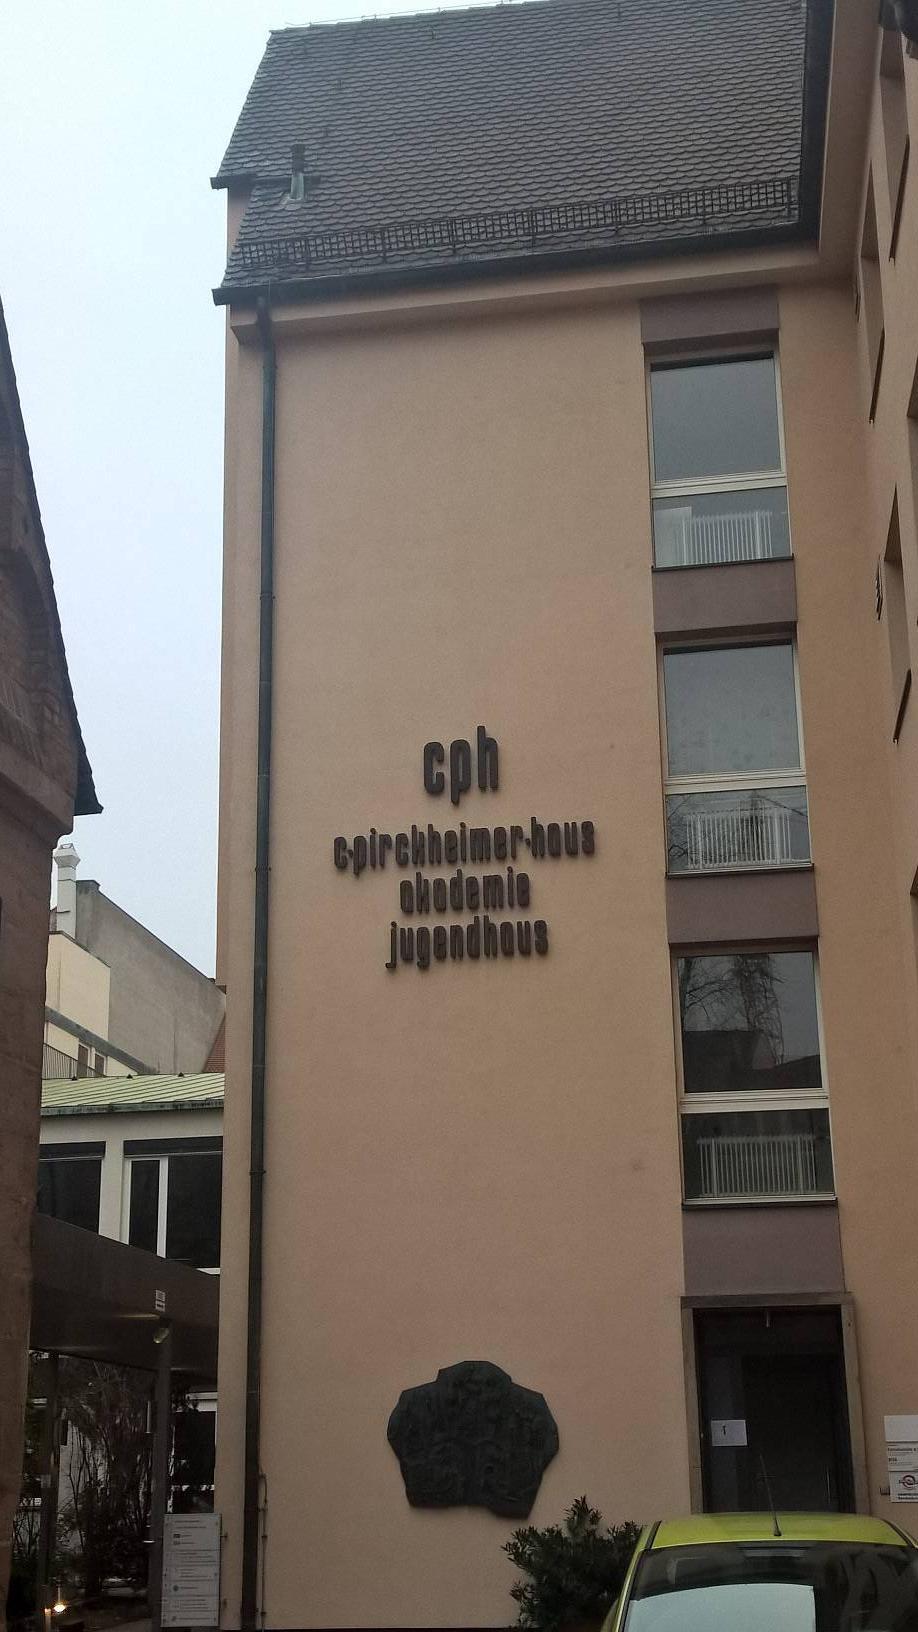 Tagungshaus Caritas-Pirckheimer-Haus In Nürnberg